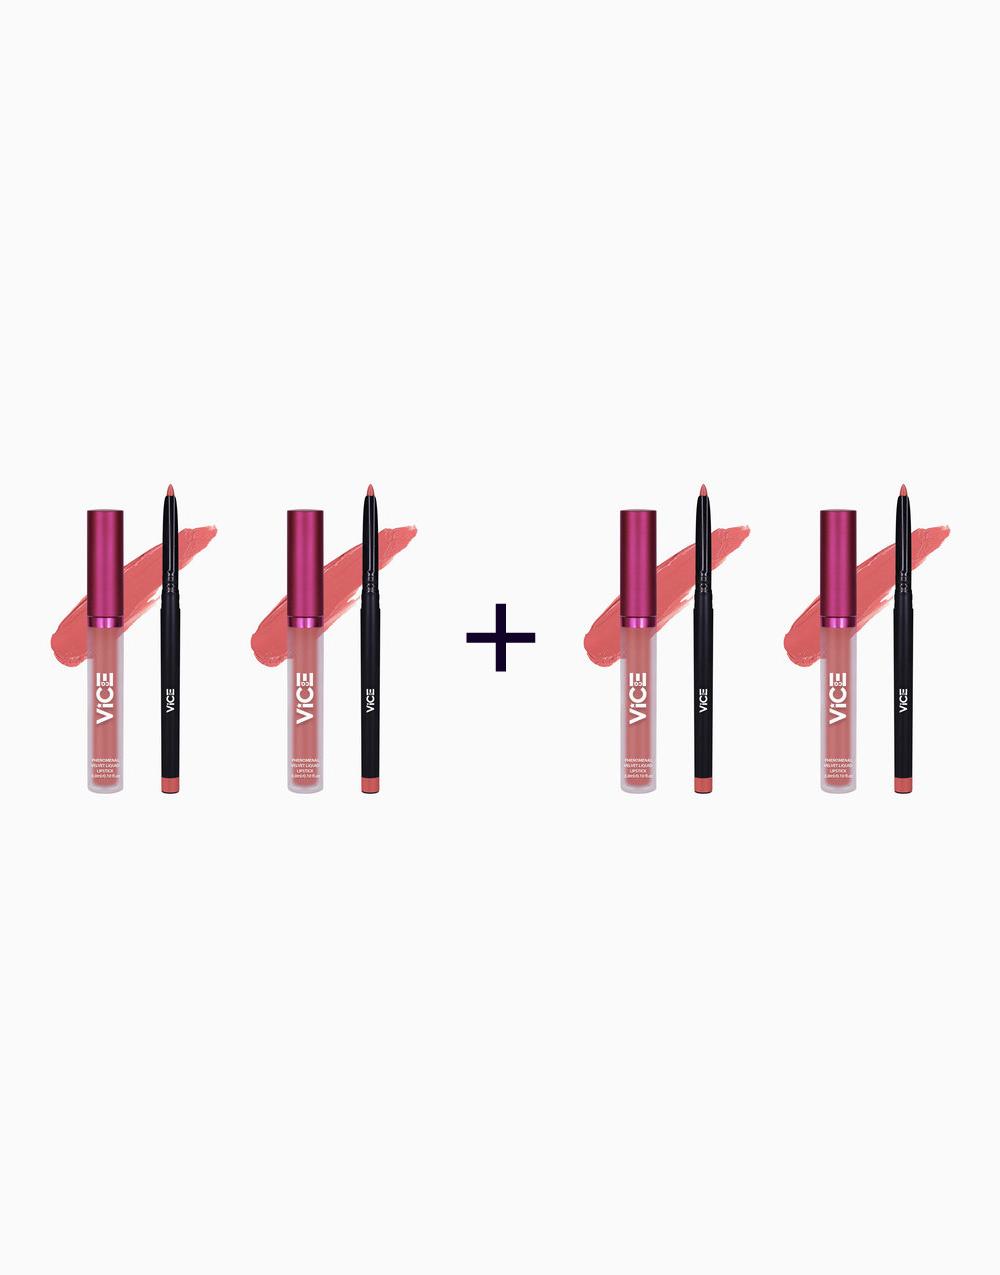 Phenomenal Velvet Lip Kit (3ml + 0.25g) (Buy 2, Take 2) by Vice Cosmetics   Izkeravu